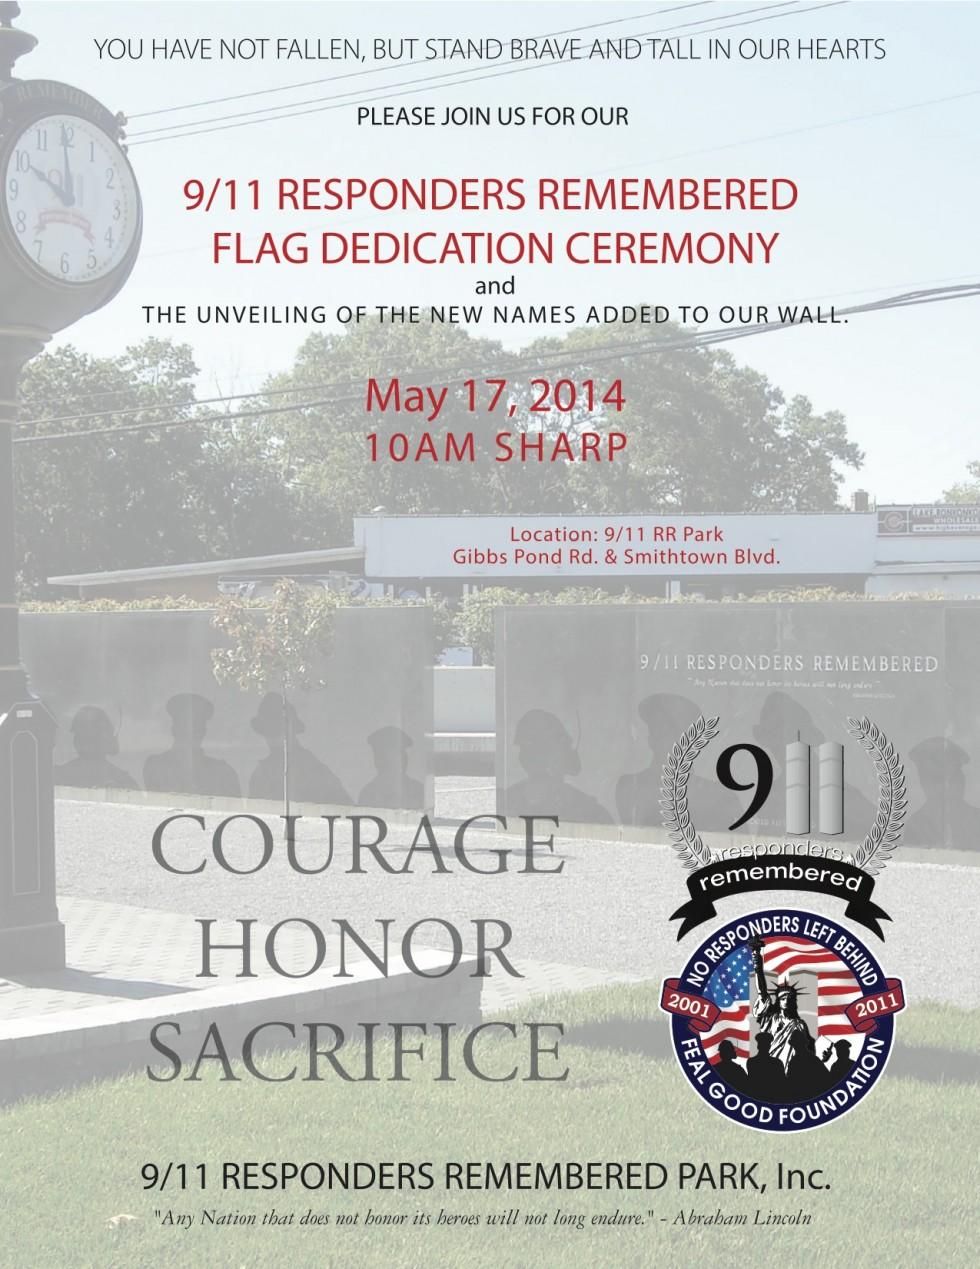 9/11 Responders Remembered Flag Dedication Ceremony